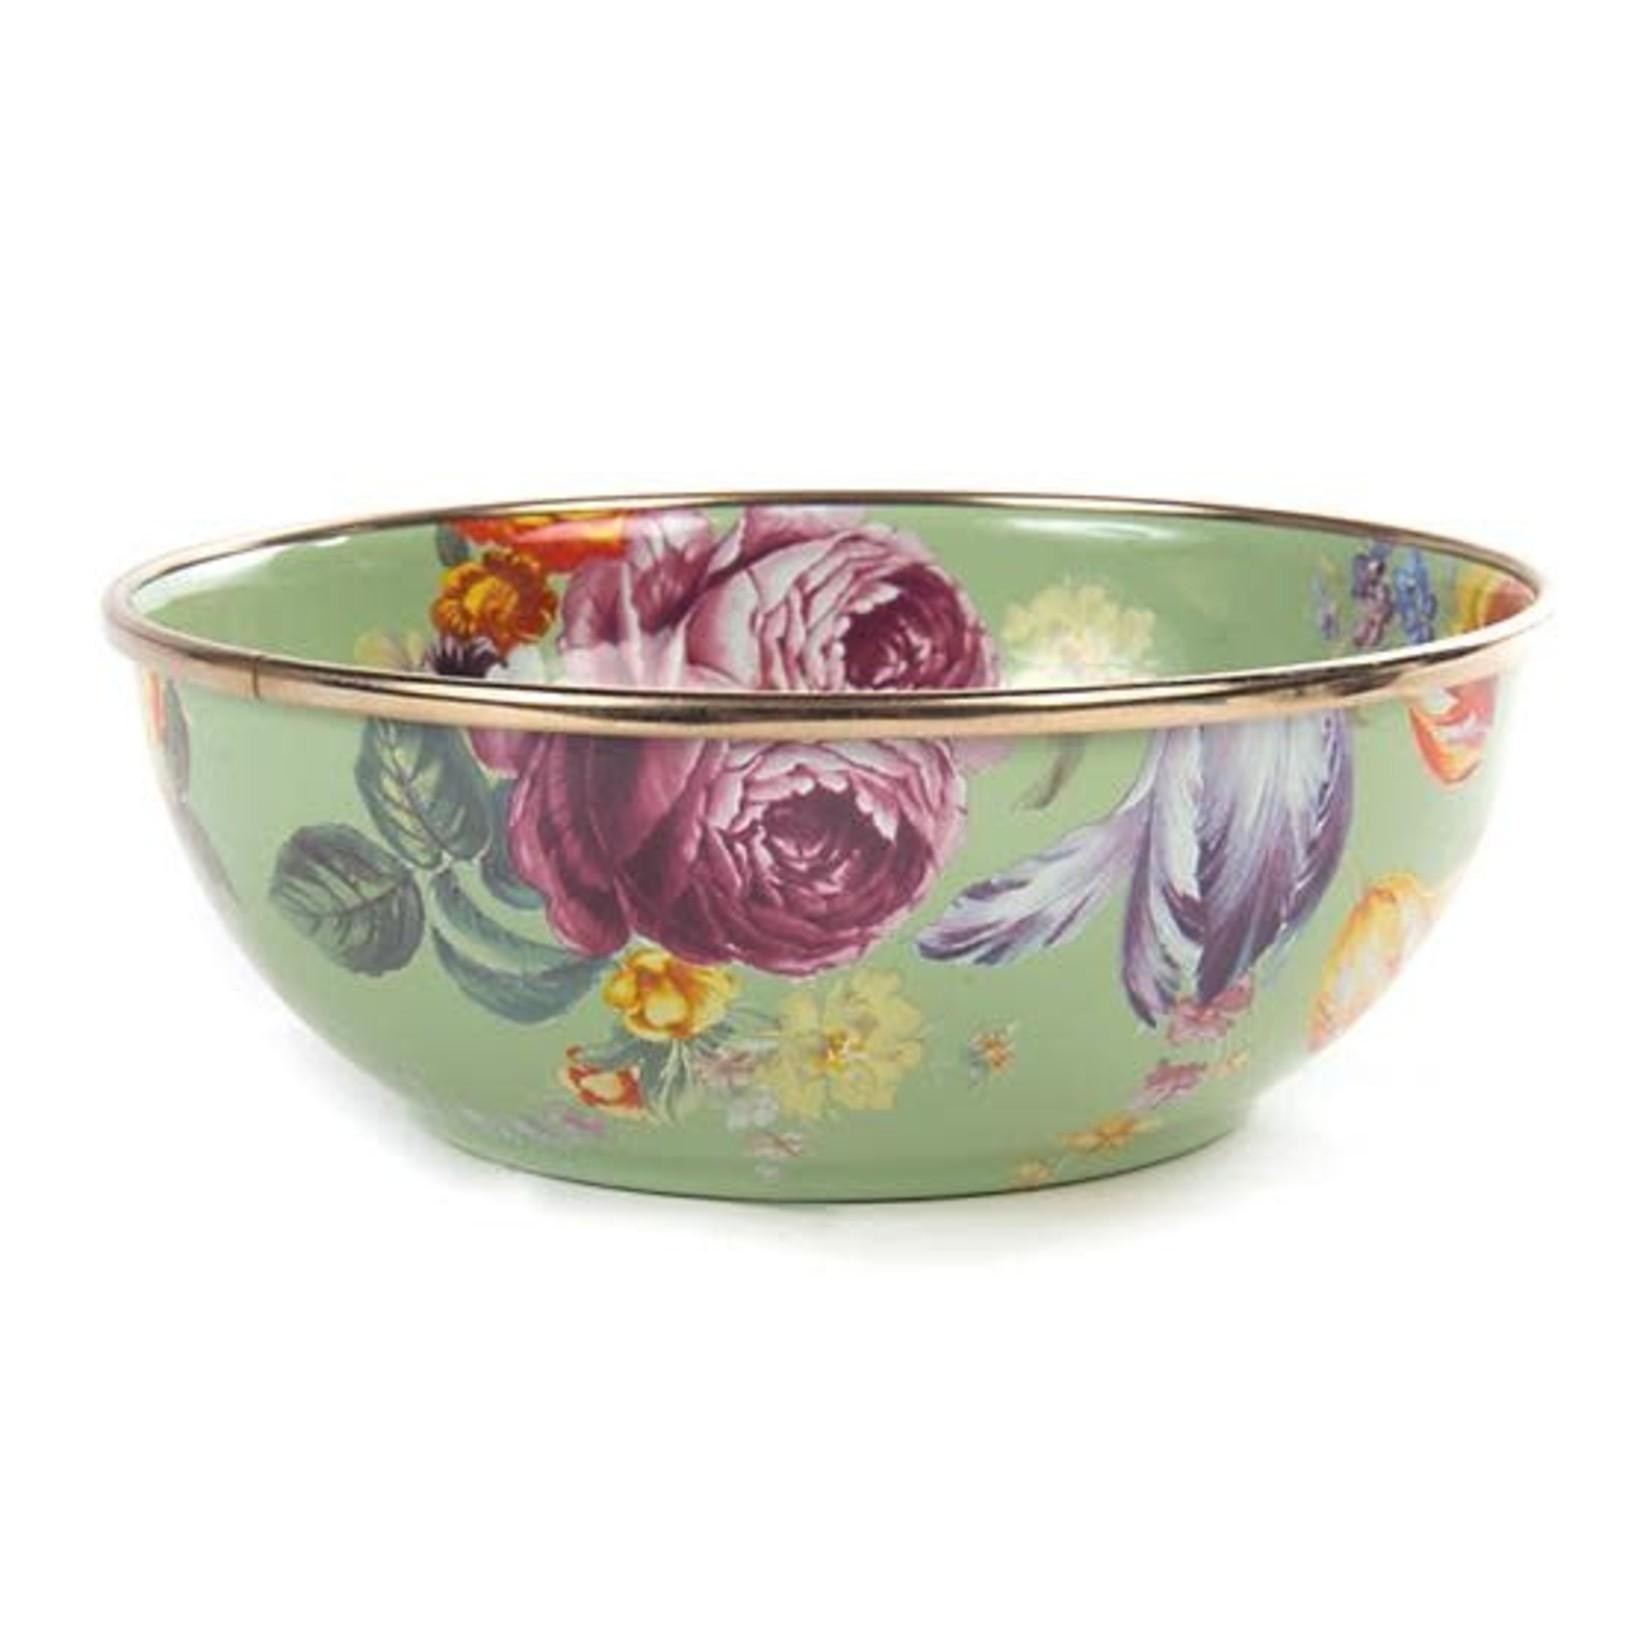 MacKenzie Childs Flower Market Everyday Bowl - Green